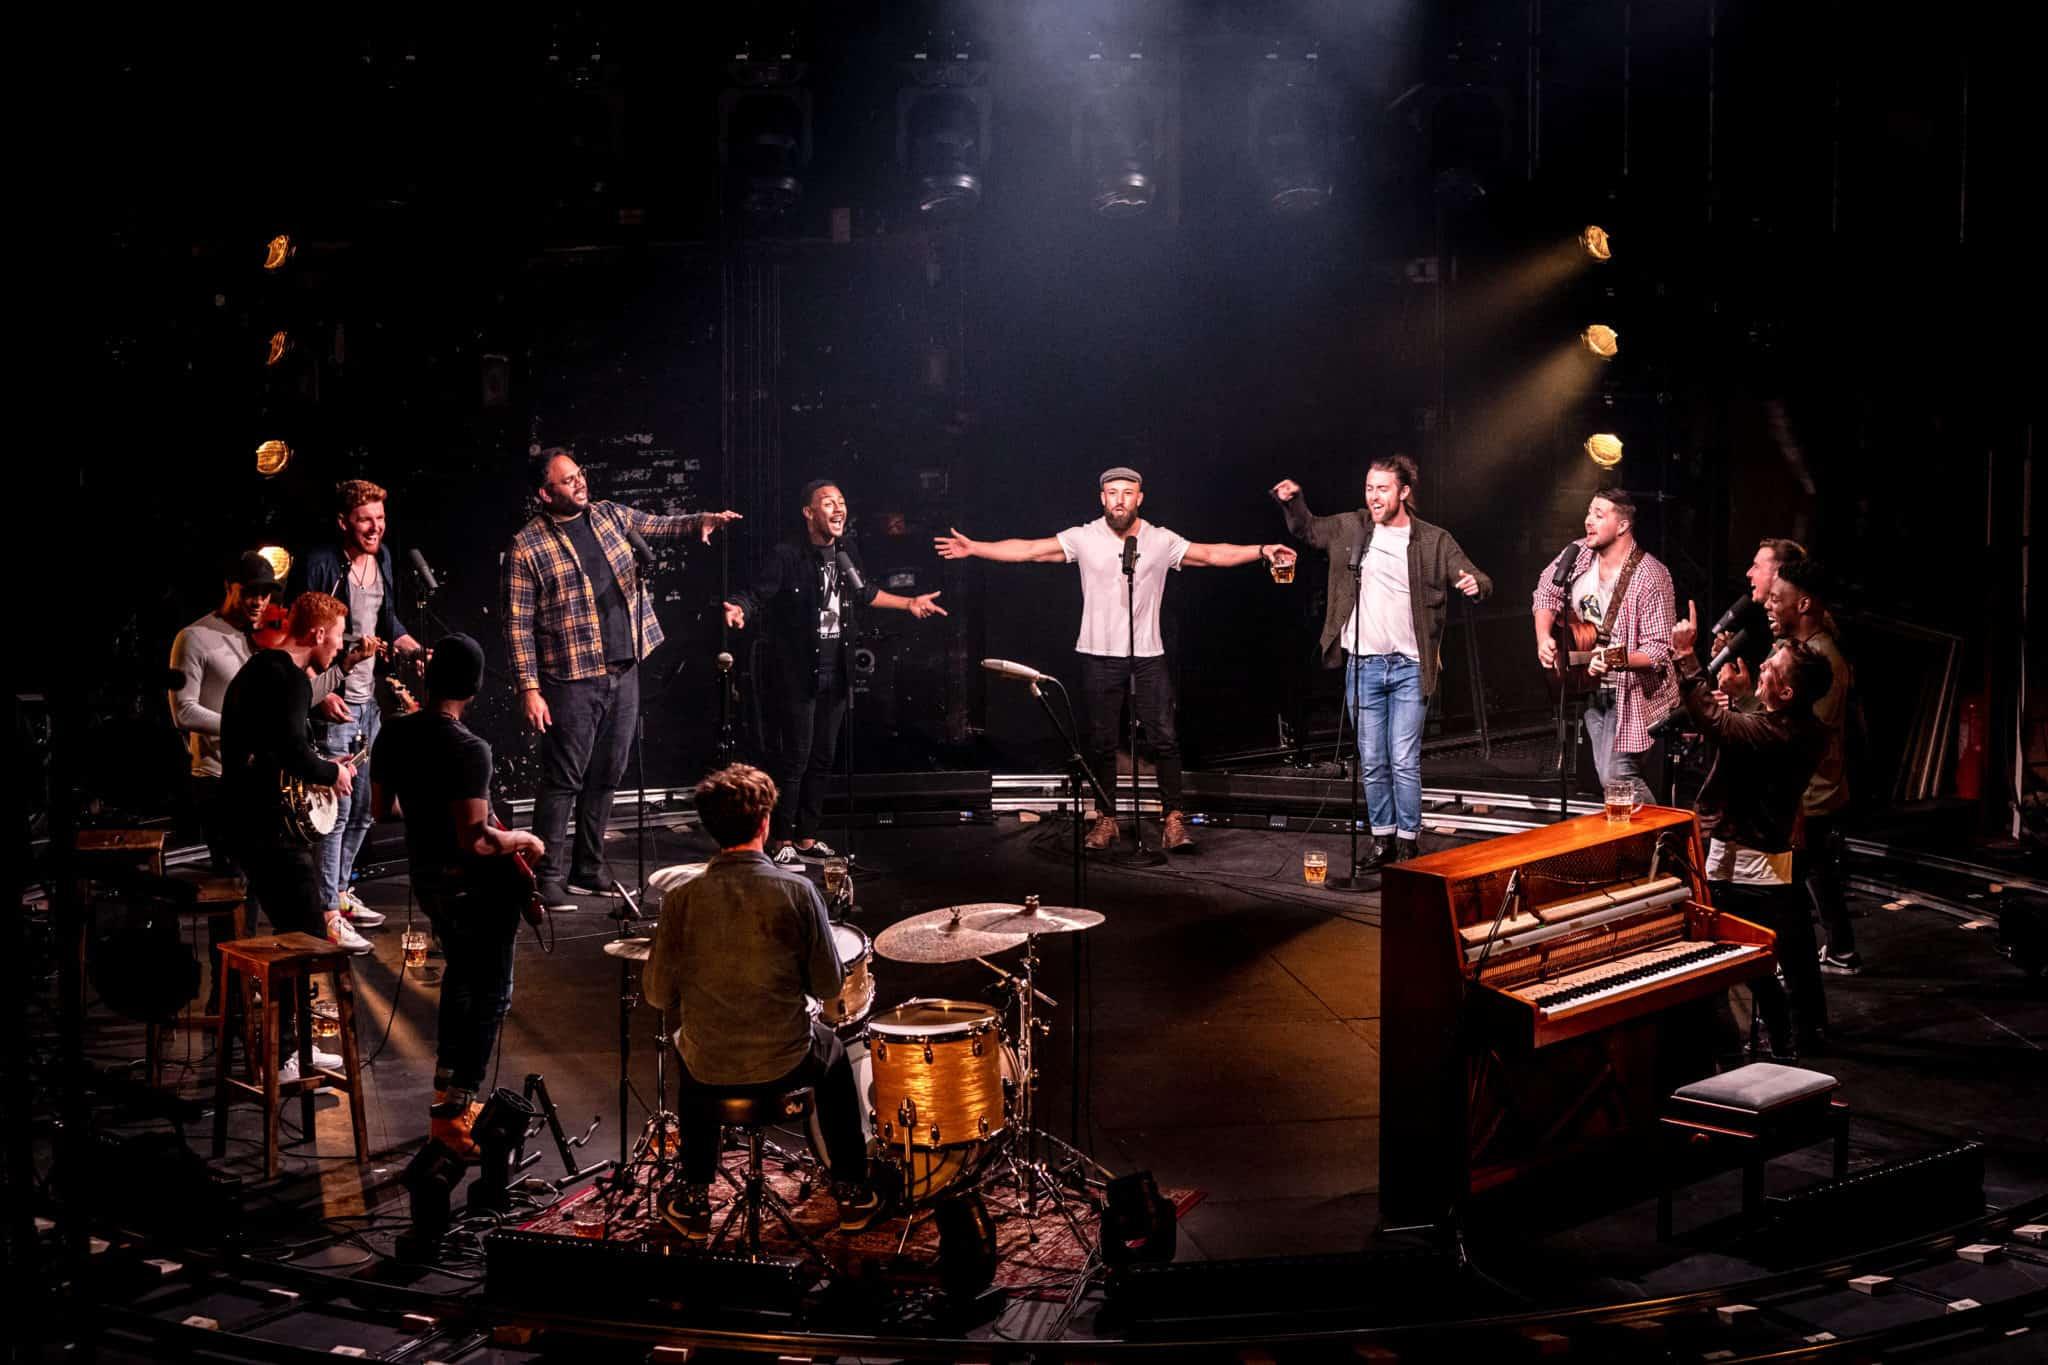 choir of man norwegian cruise docuseries